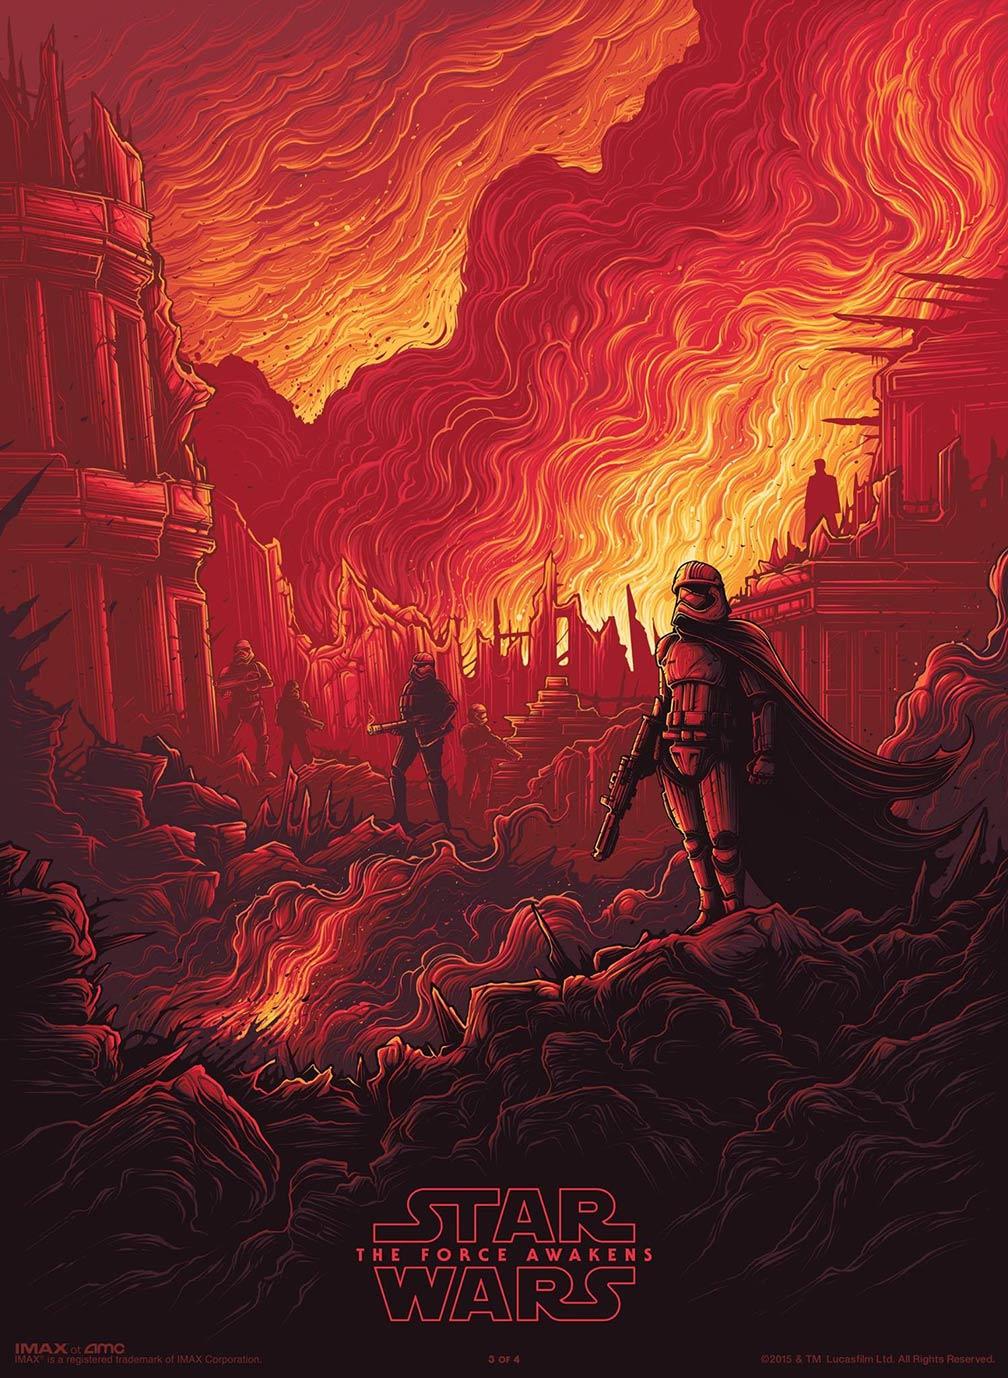 Star Wars: Episode VII - The Force Awakens Poster #24